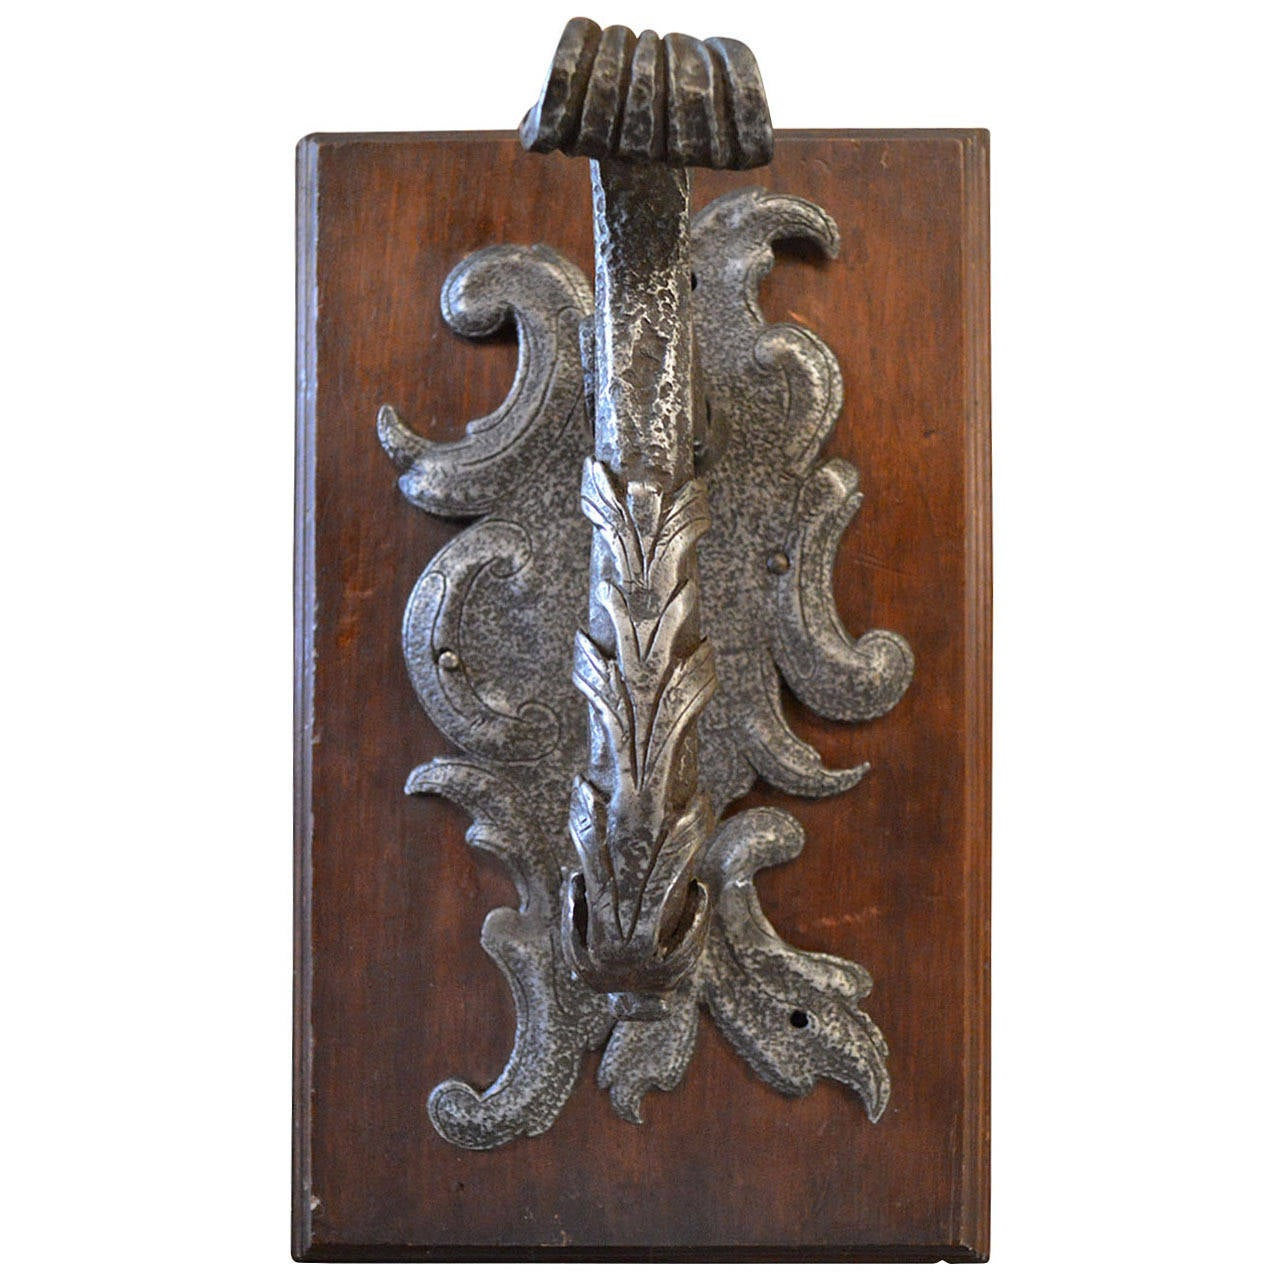 Very Rare French Rococo Hand Wrought Iron Door Knocker At